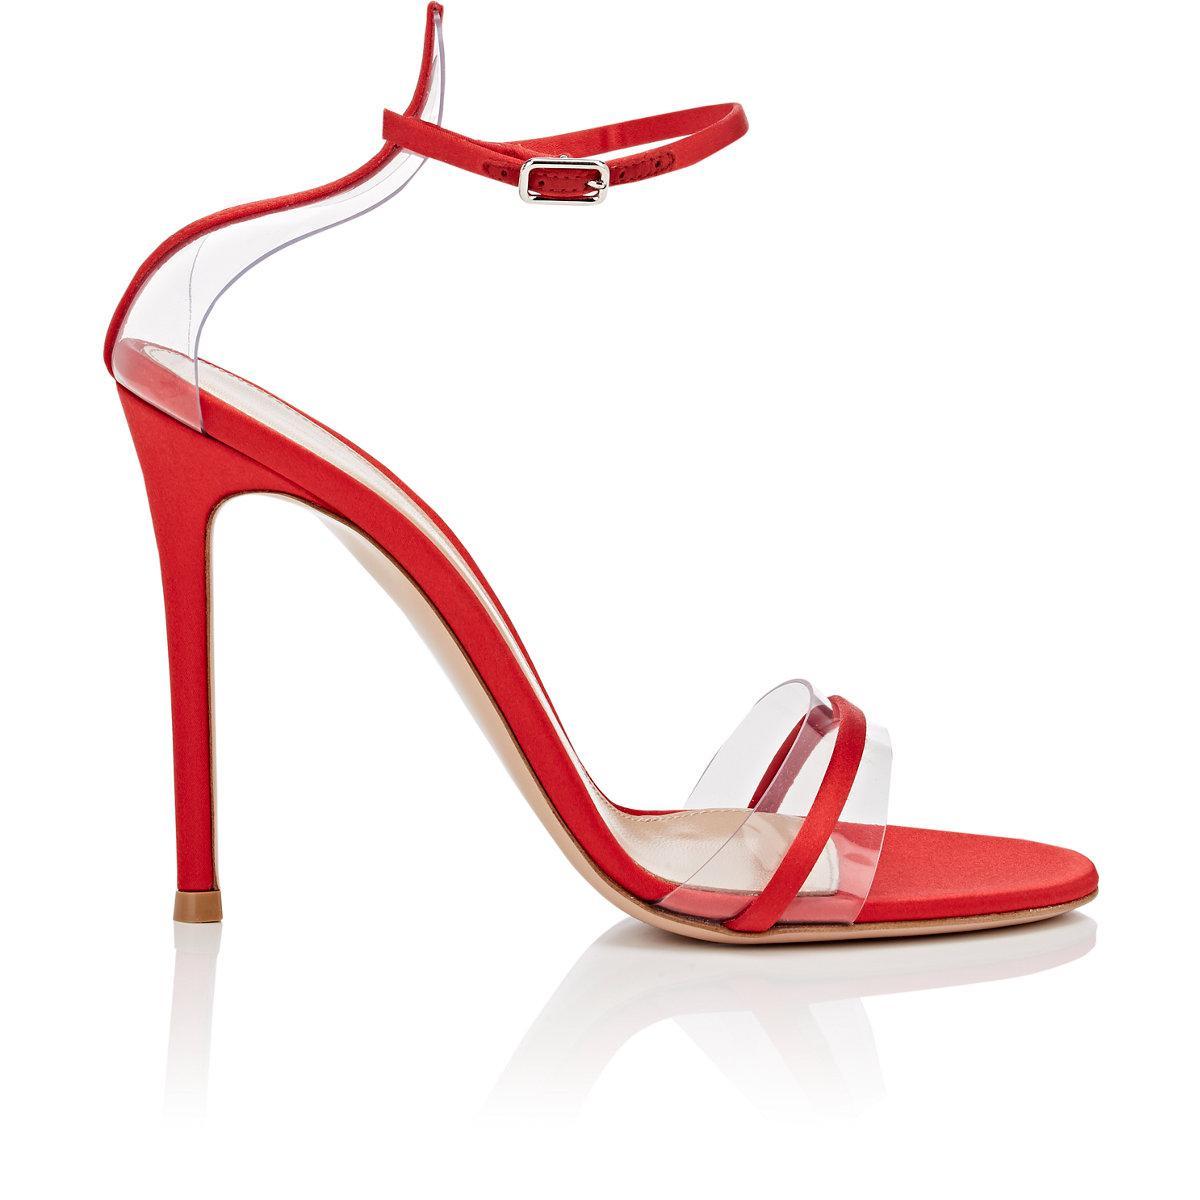 b4c808ffe Lyst - Gianvito Rossi G String Satin   Pvc Sandals in Red